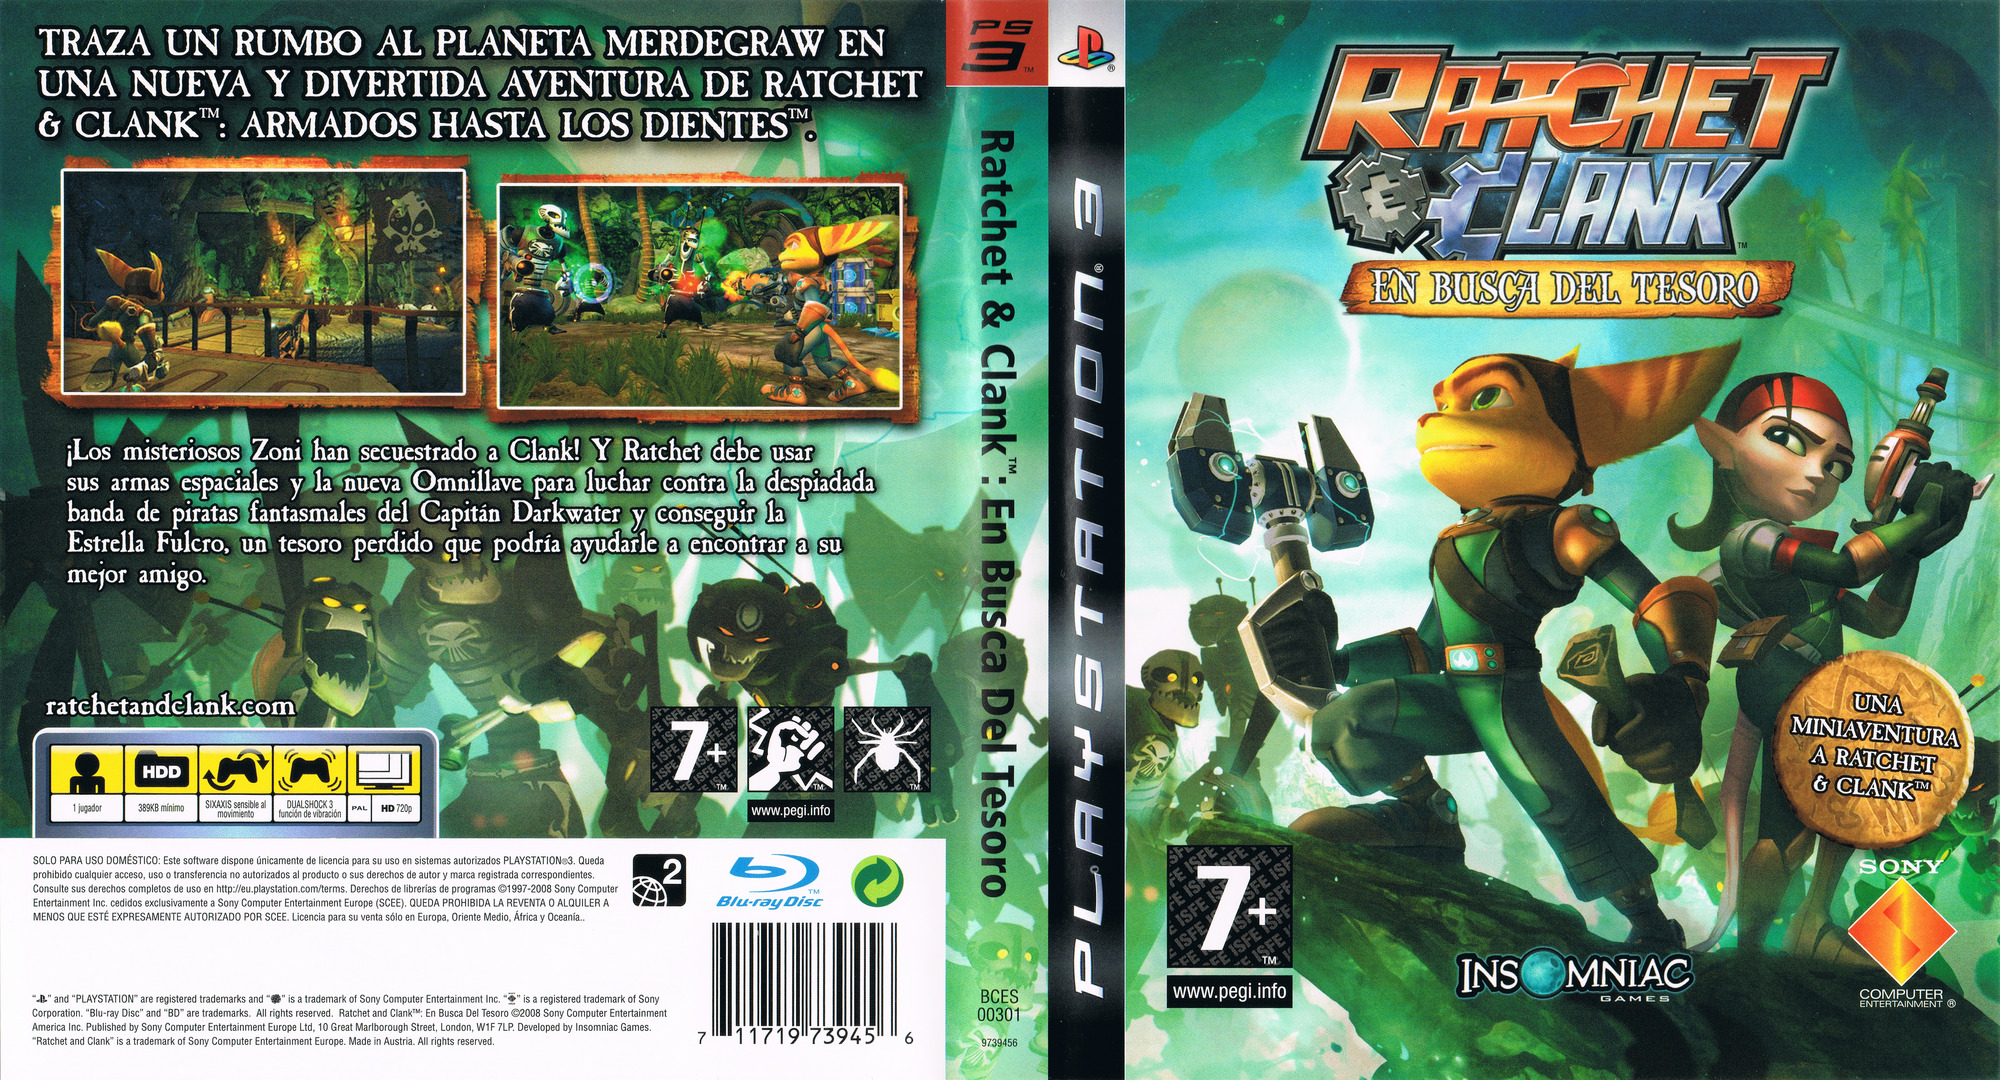 Ratchet & Clank: En busca del tesoro PS3 coverfullHQ (BCES00301)